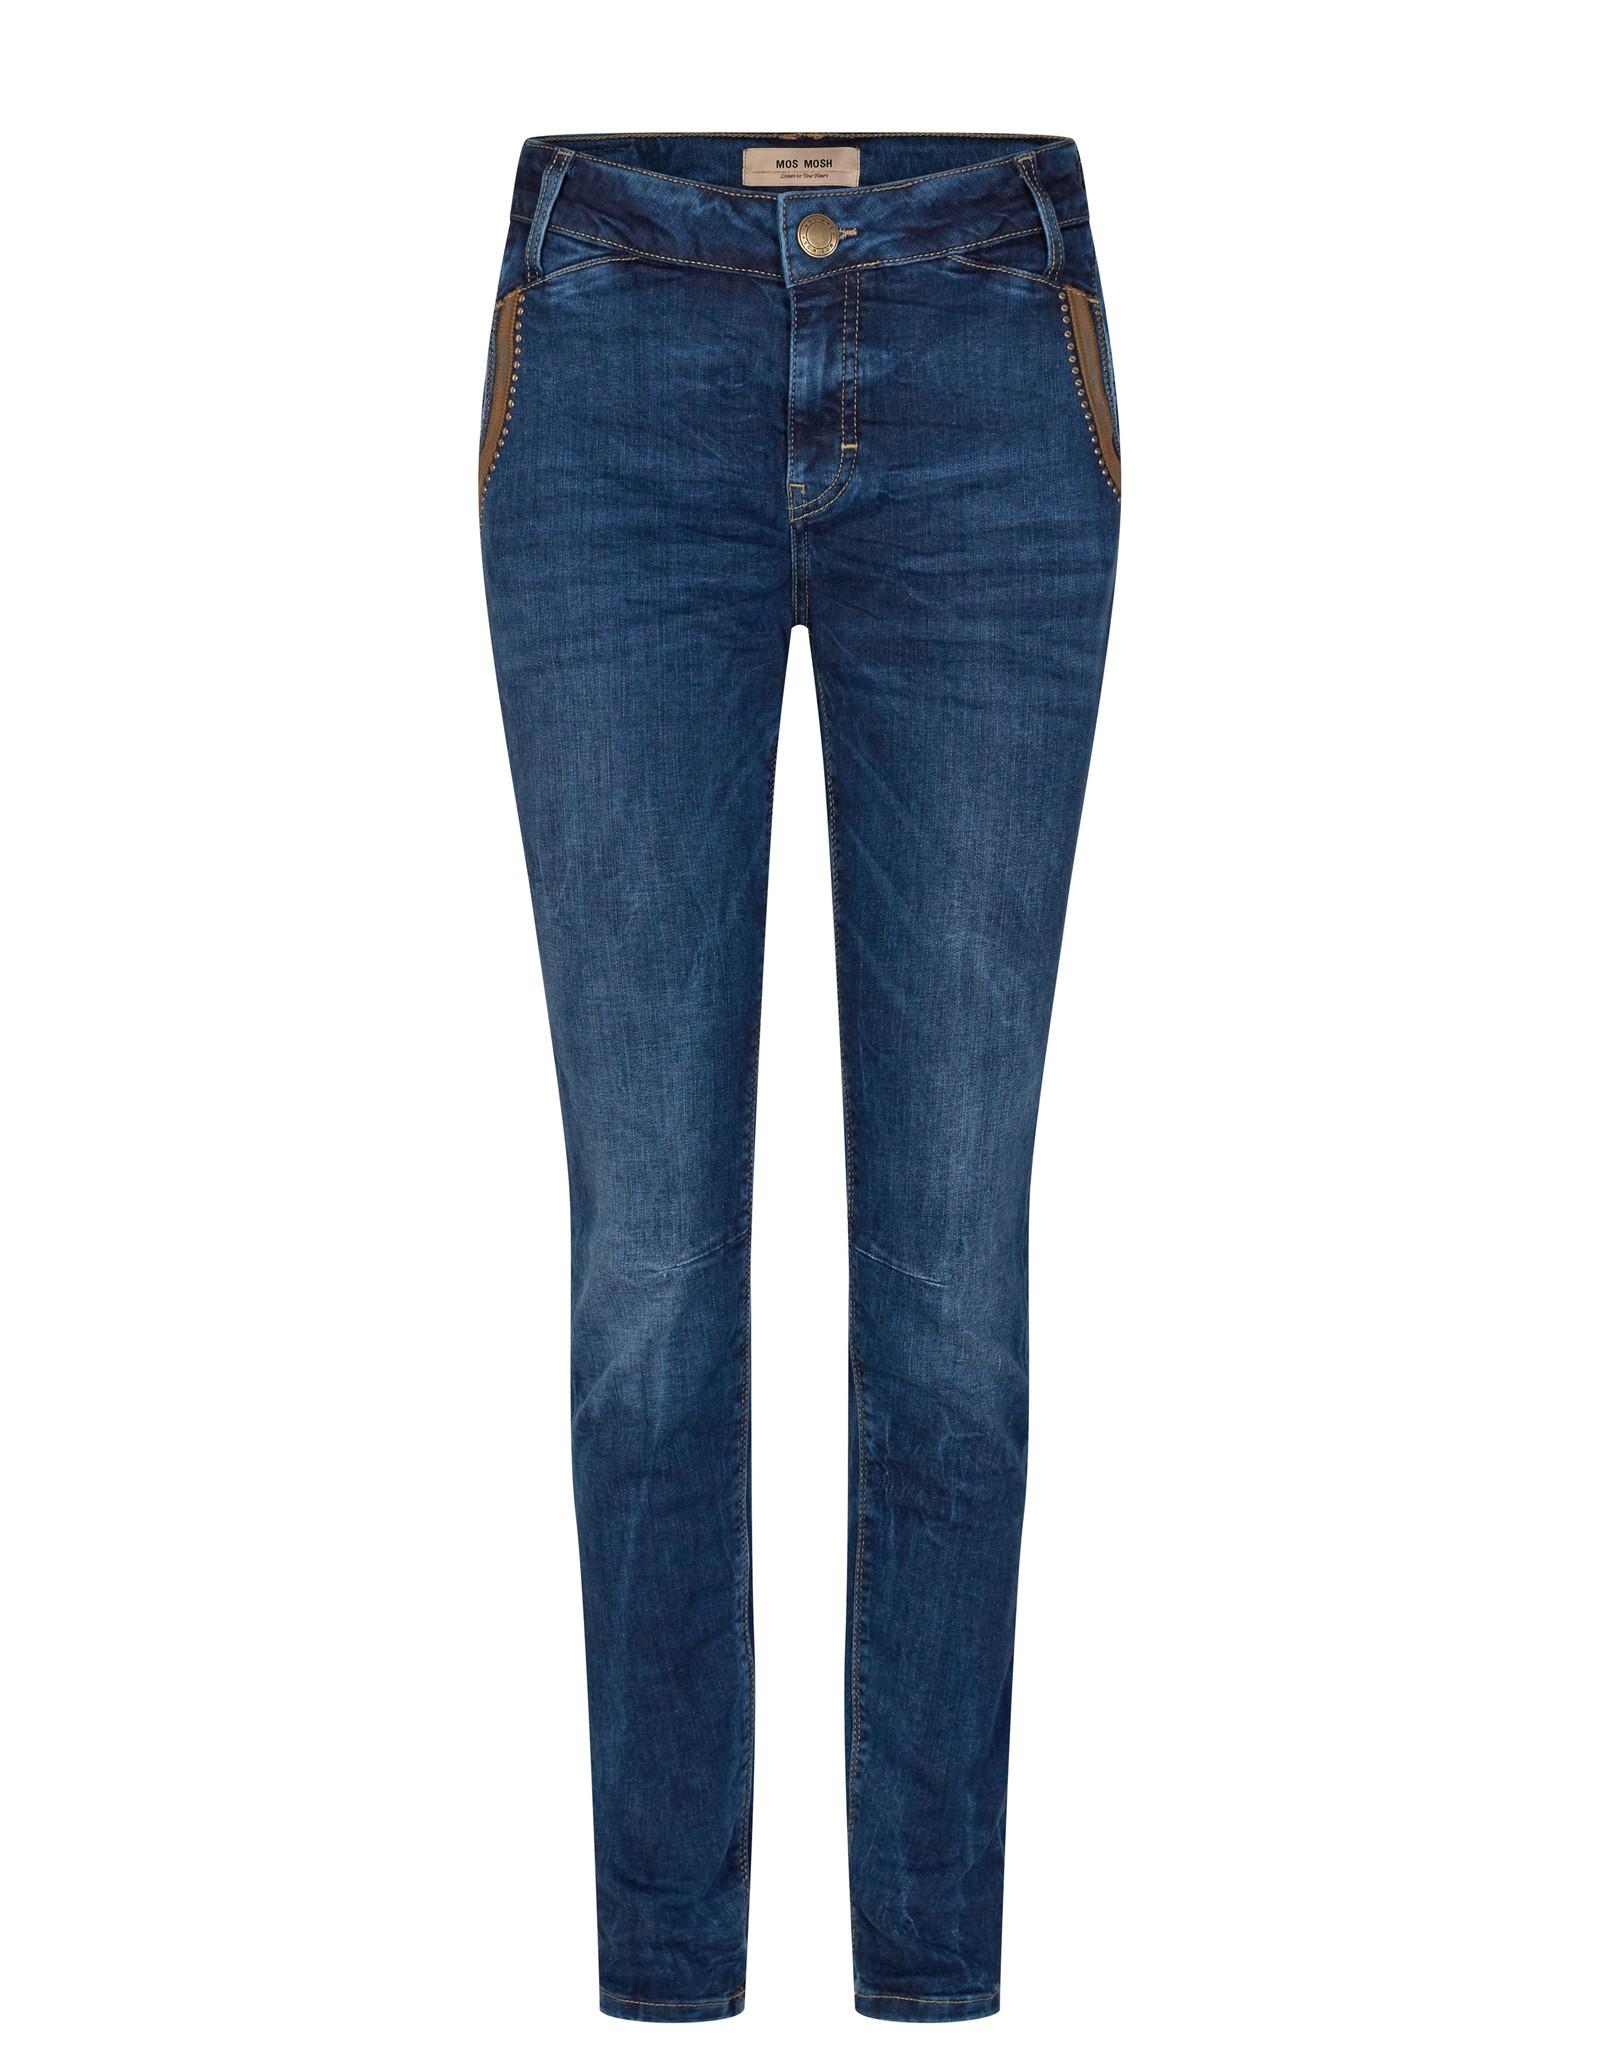 Mos Mosh Etta Leather Jeans